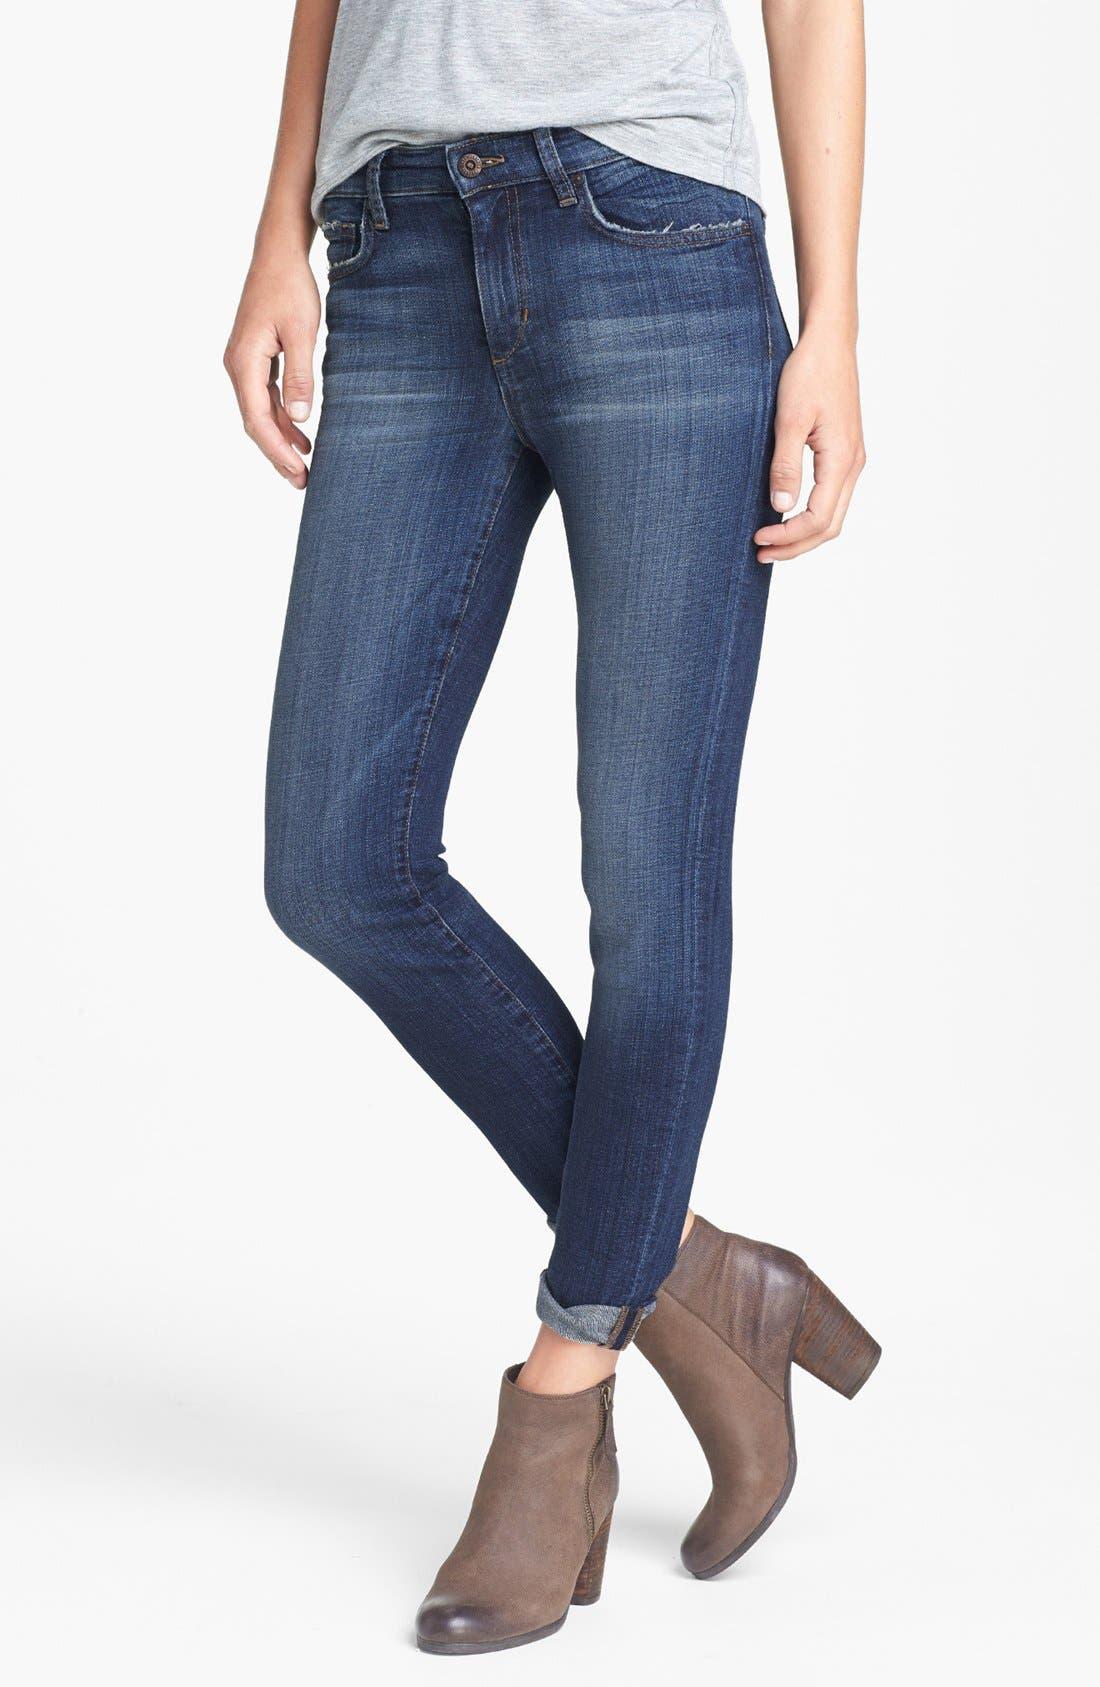 Alternate Image 1 Selected - Joe's Straight Leg Ankle Jeans (Genna)